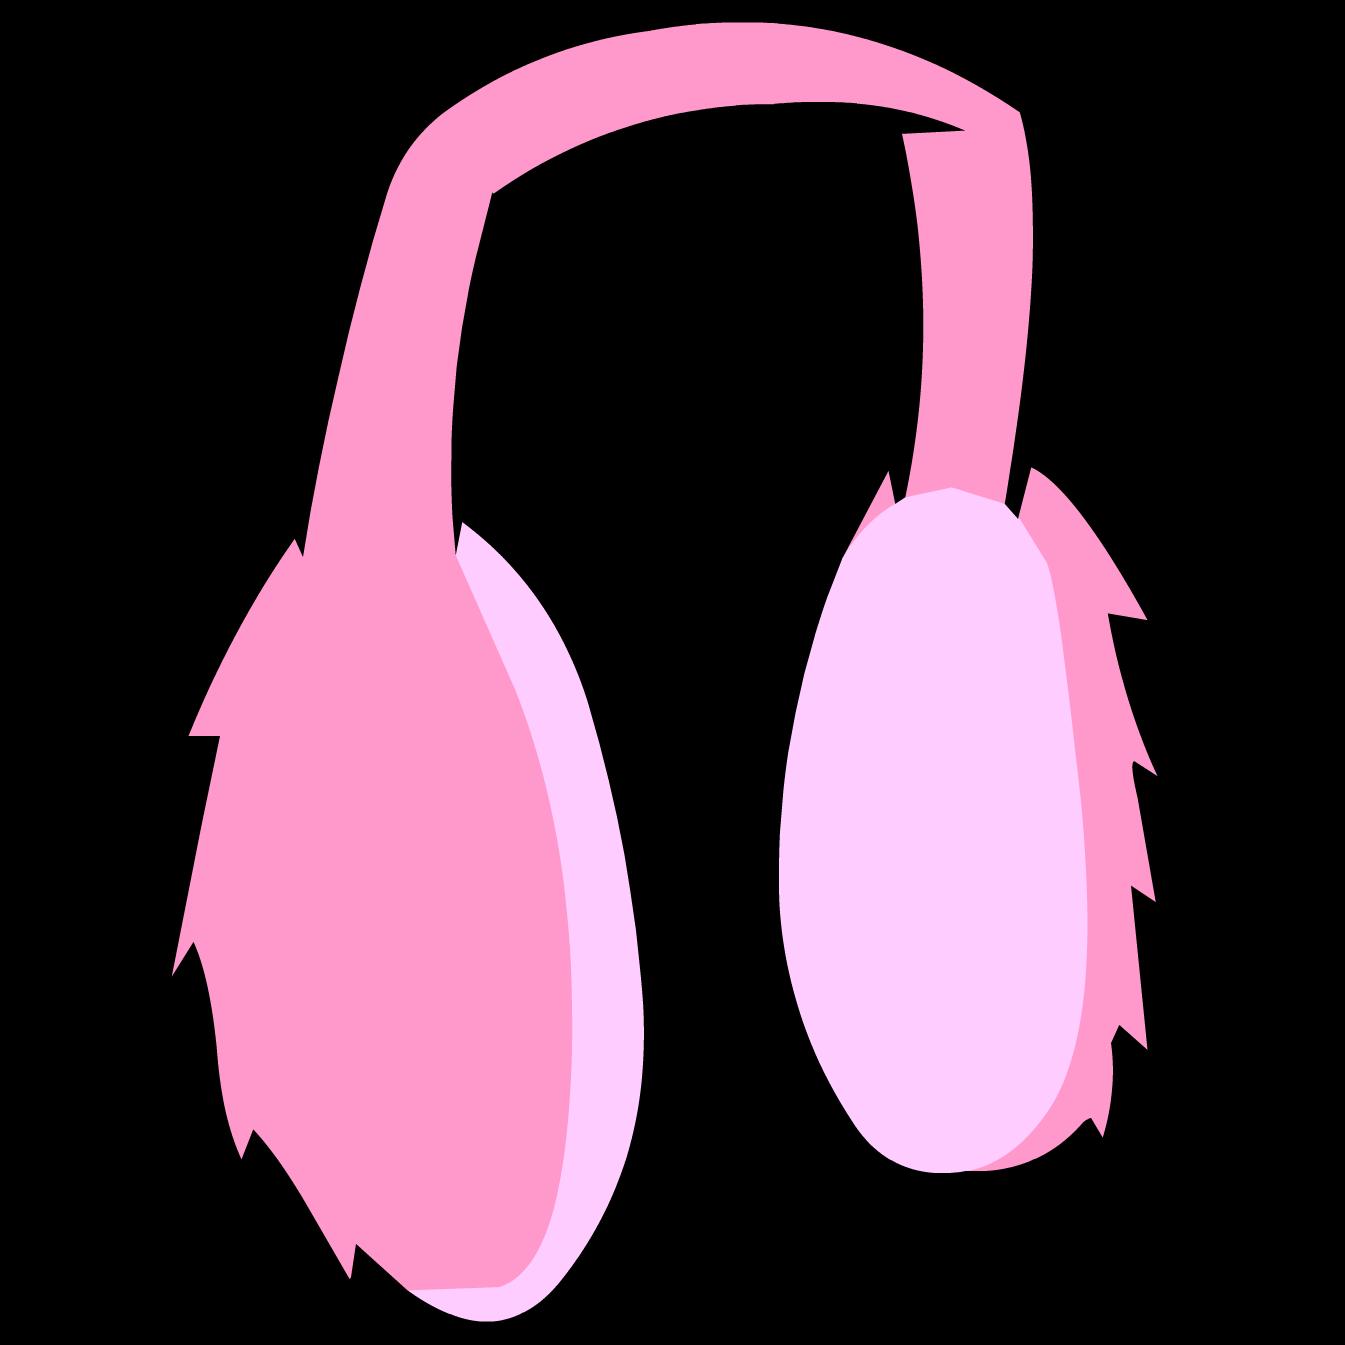 Winter clipart pink. Image pinkearmuffs png club